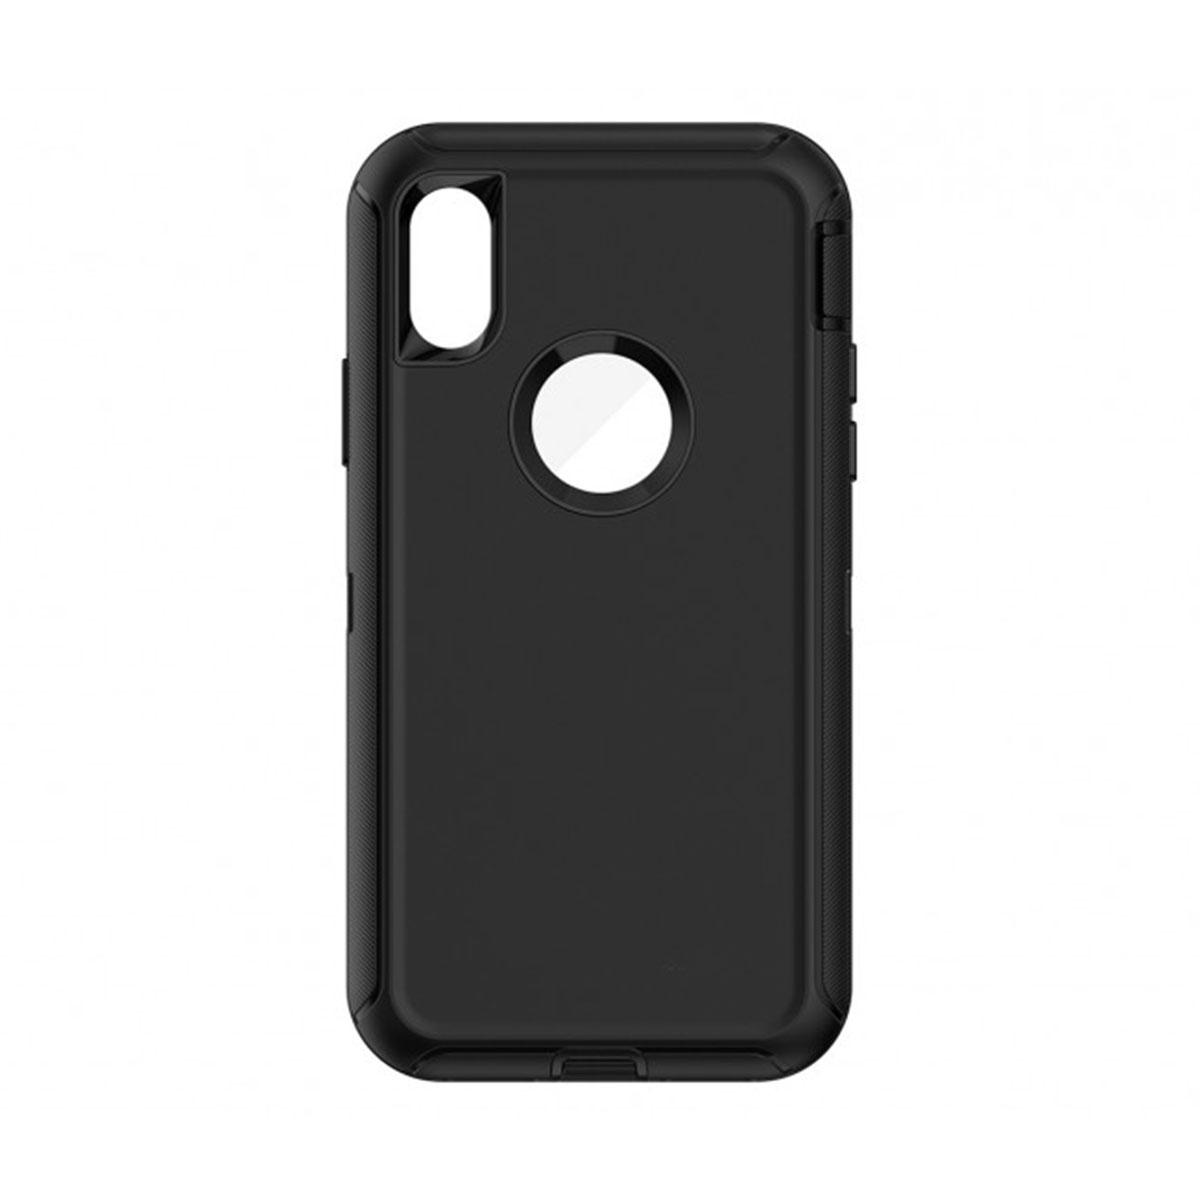 Iphone Xr Black Rugged Case Otterbox